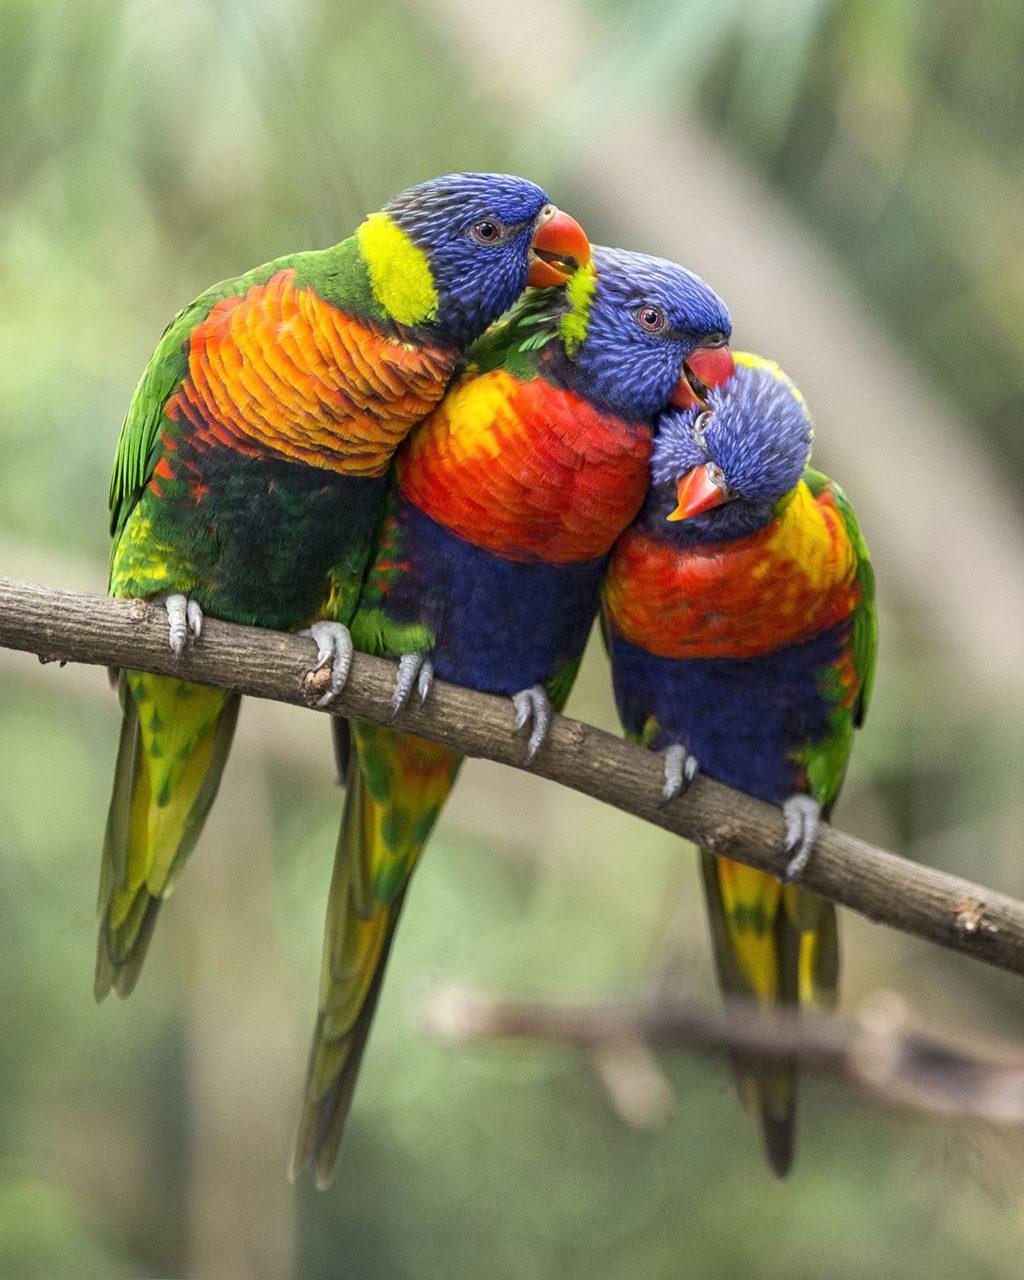 Rainbow-lorikeet-1-1024x1280 Top 20 Most Beautiful Colorful Birds in The World